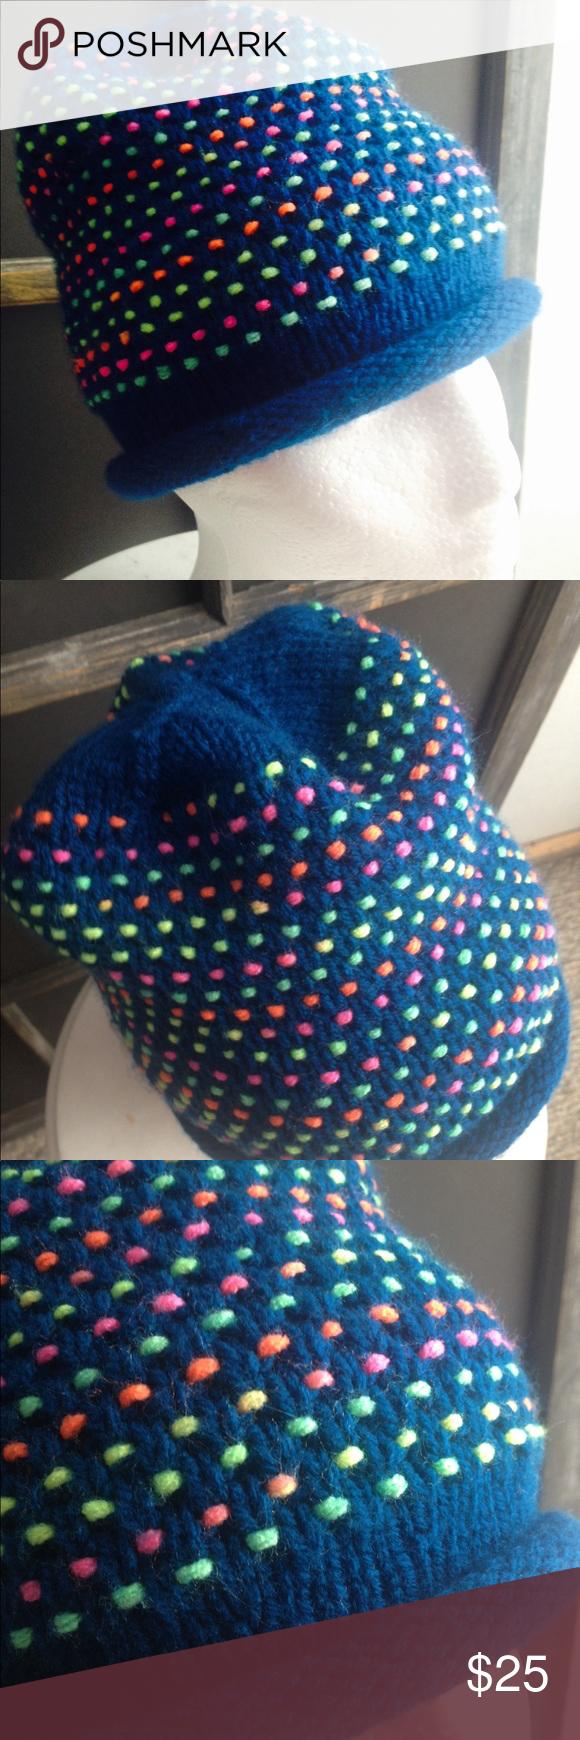 aa4374d990e VINTAGE Knit Neon Teal Winter Beanie Cap Hat